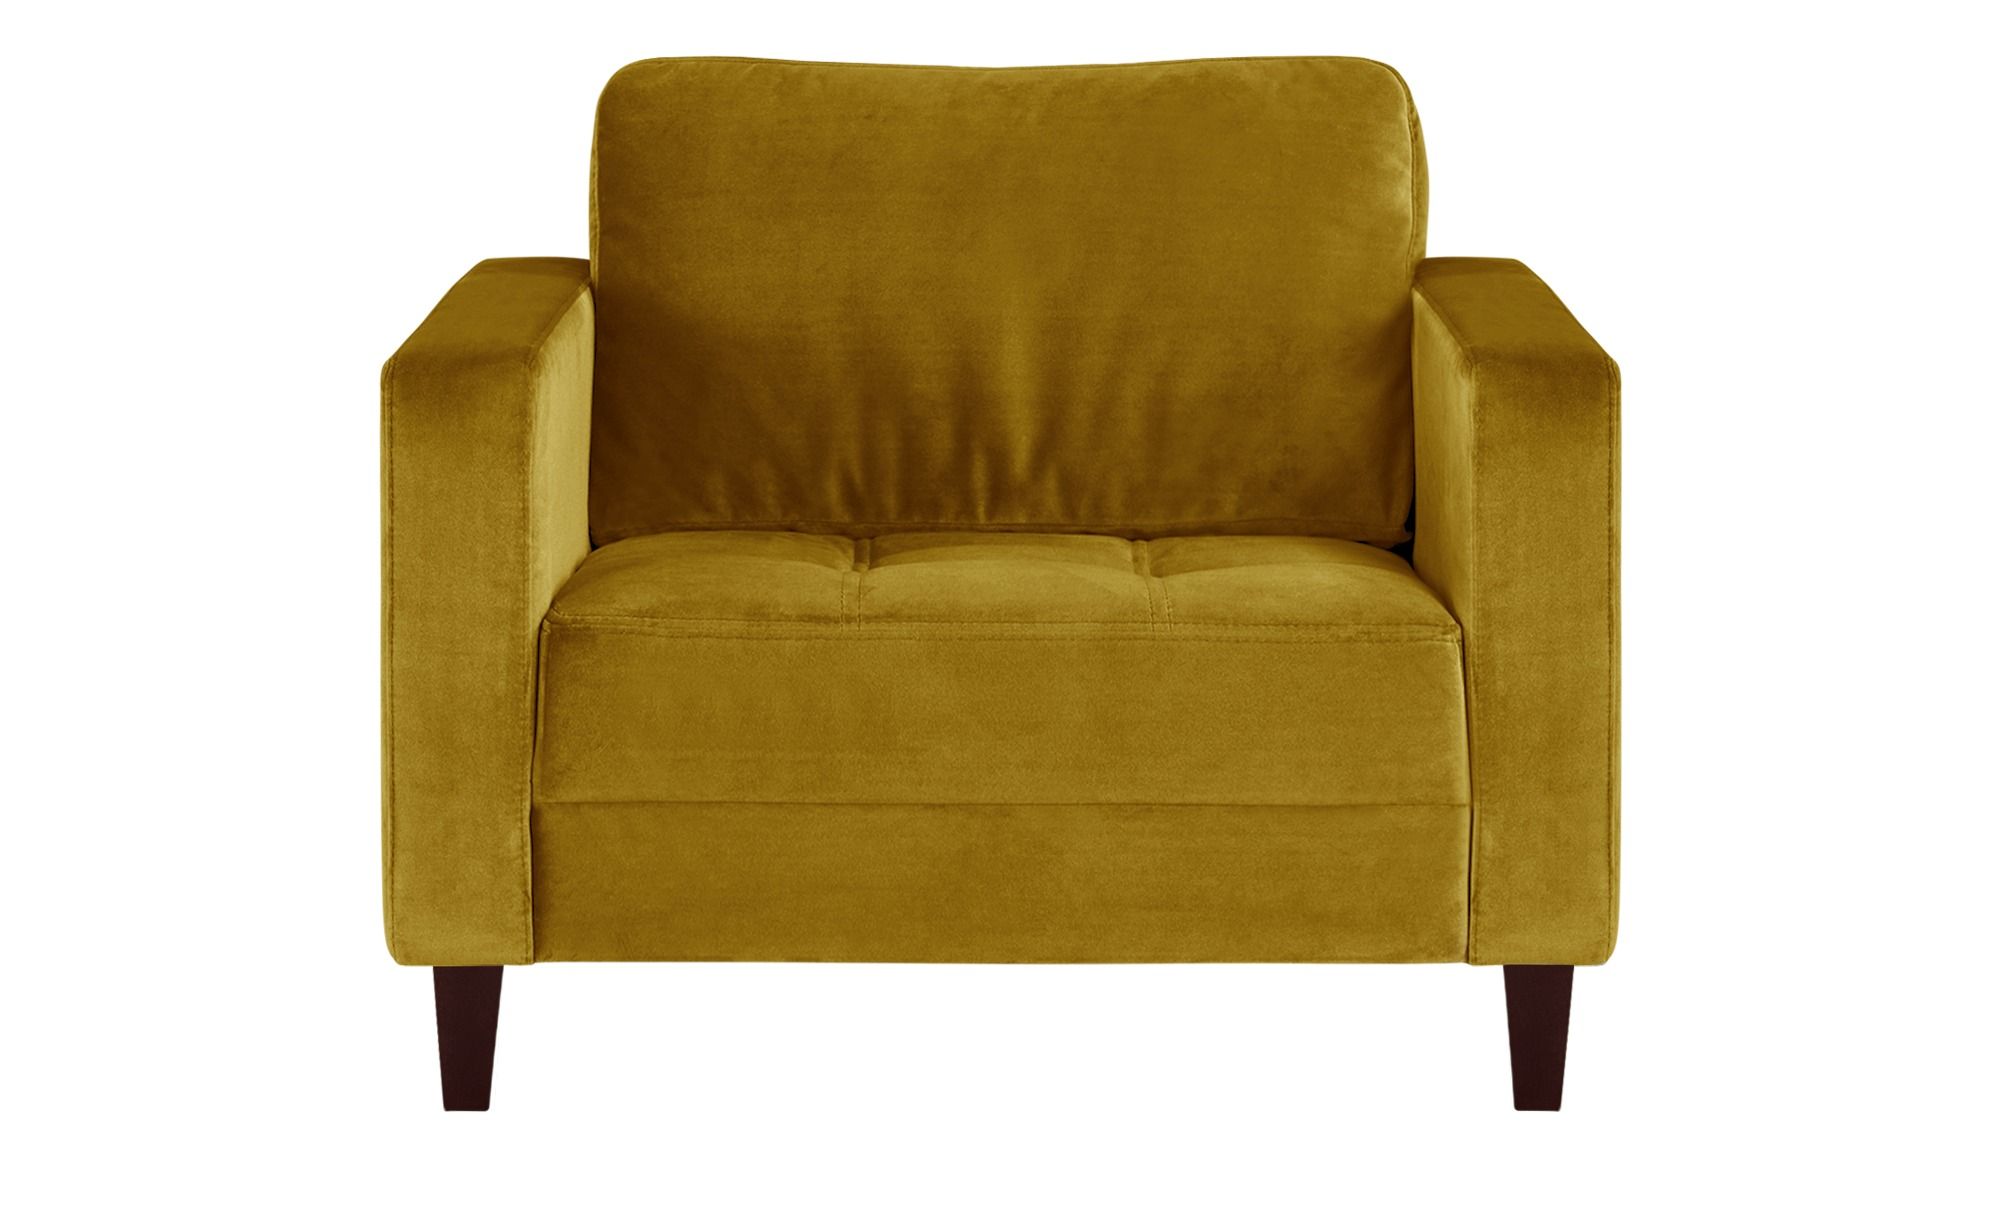 smart Sessel gelb - Stoff Geradine ¦ gelb ¦ Maße (cm): B: 91 H: 93 T: 92 Polstermöbel > Sessel > Polstersessel - Höffner